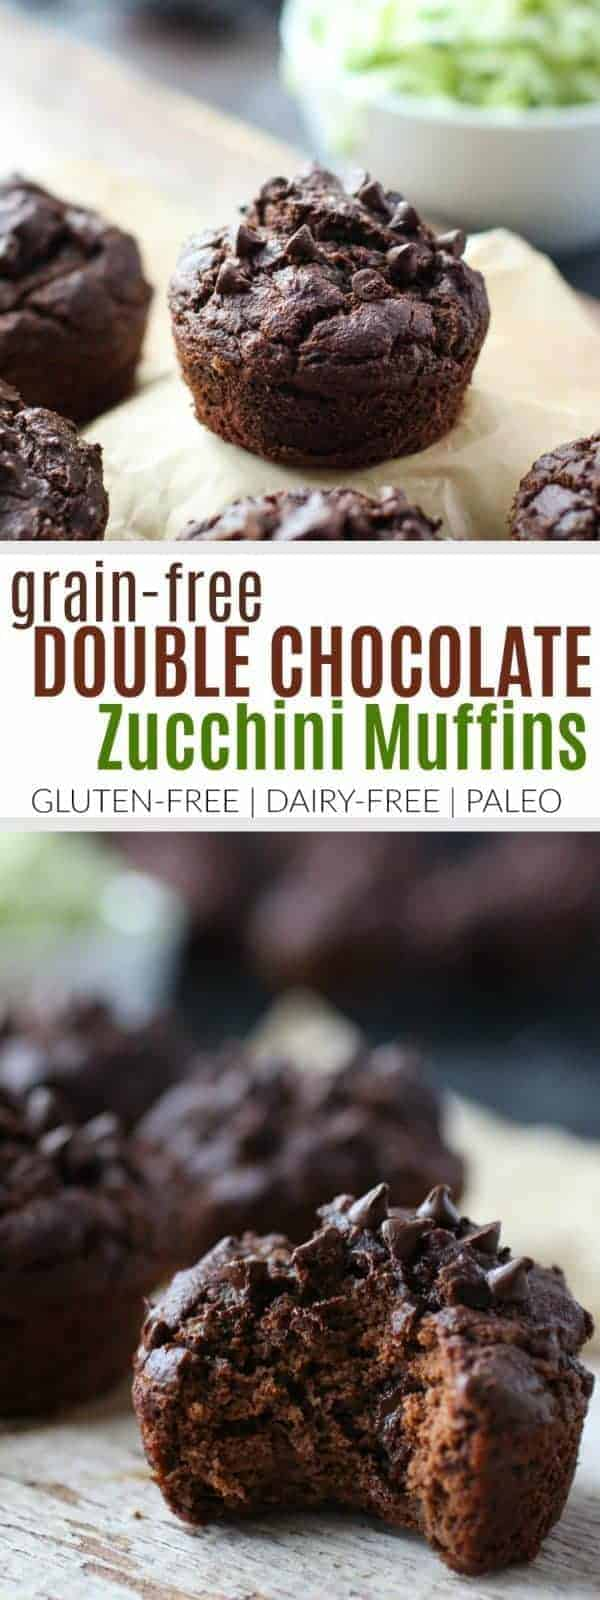 Grain-free Double Chocolate Zucchini Muffins